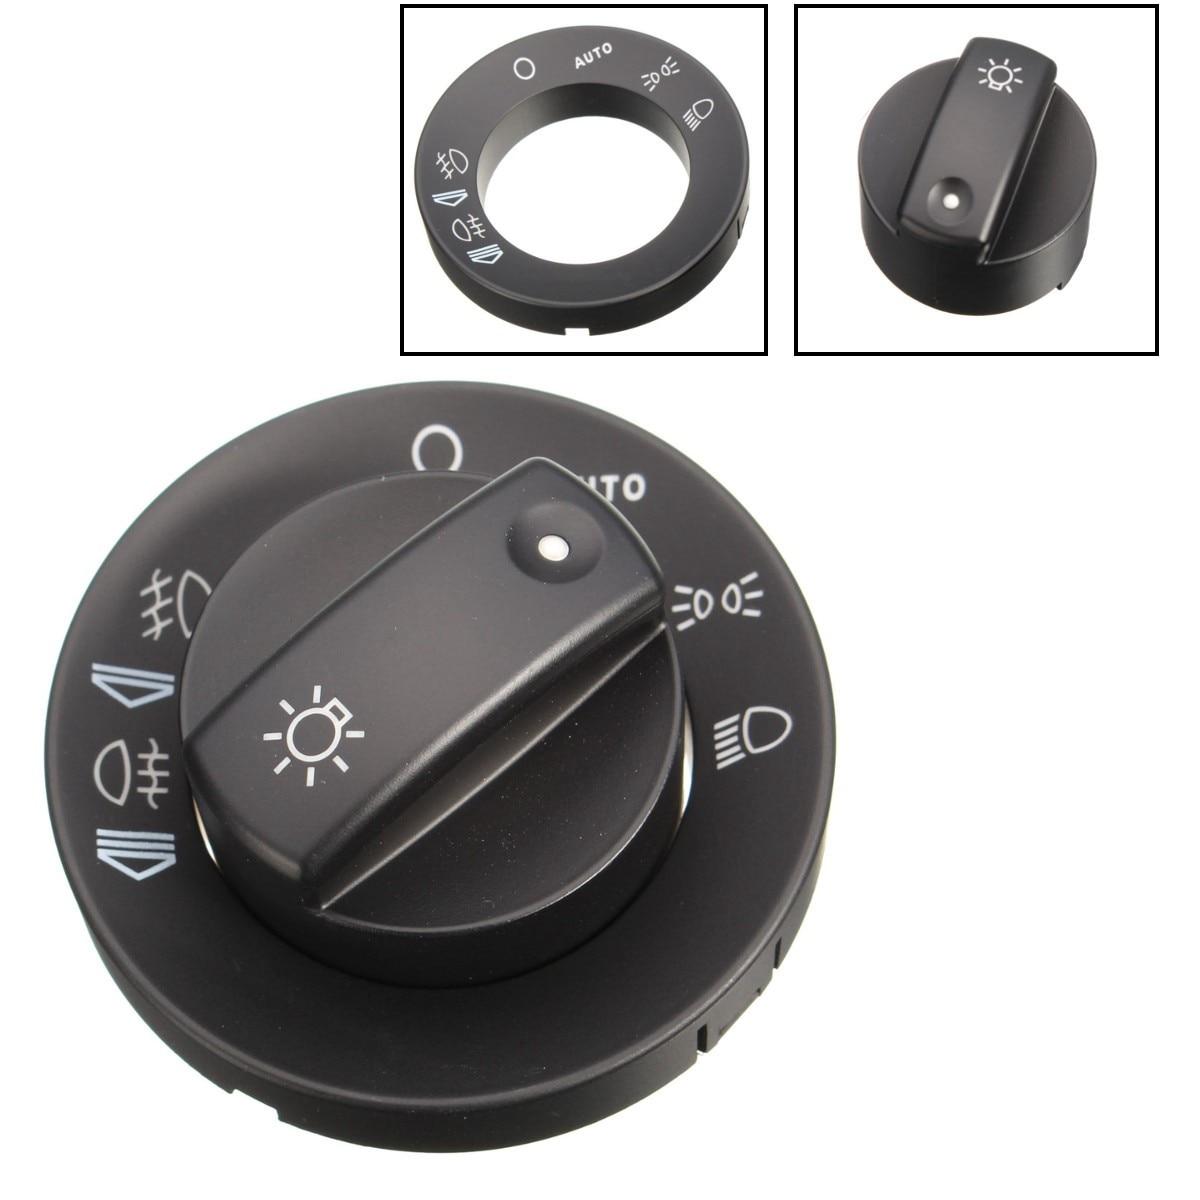 W / Auto Headlight Fog Light Control Switch Cover Cap Repair Kit For AUDI A4 S4 8E B6 B7 8E0941531B